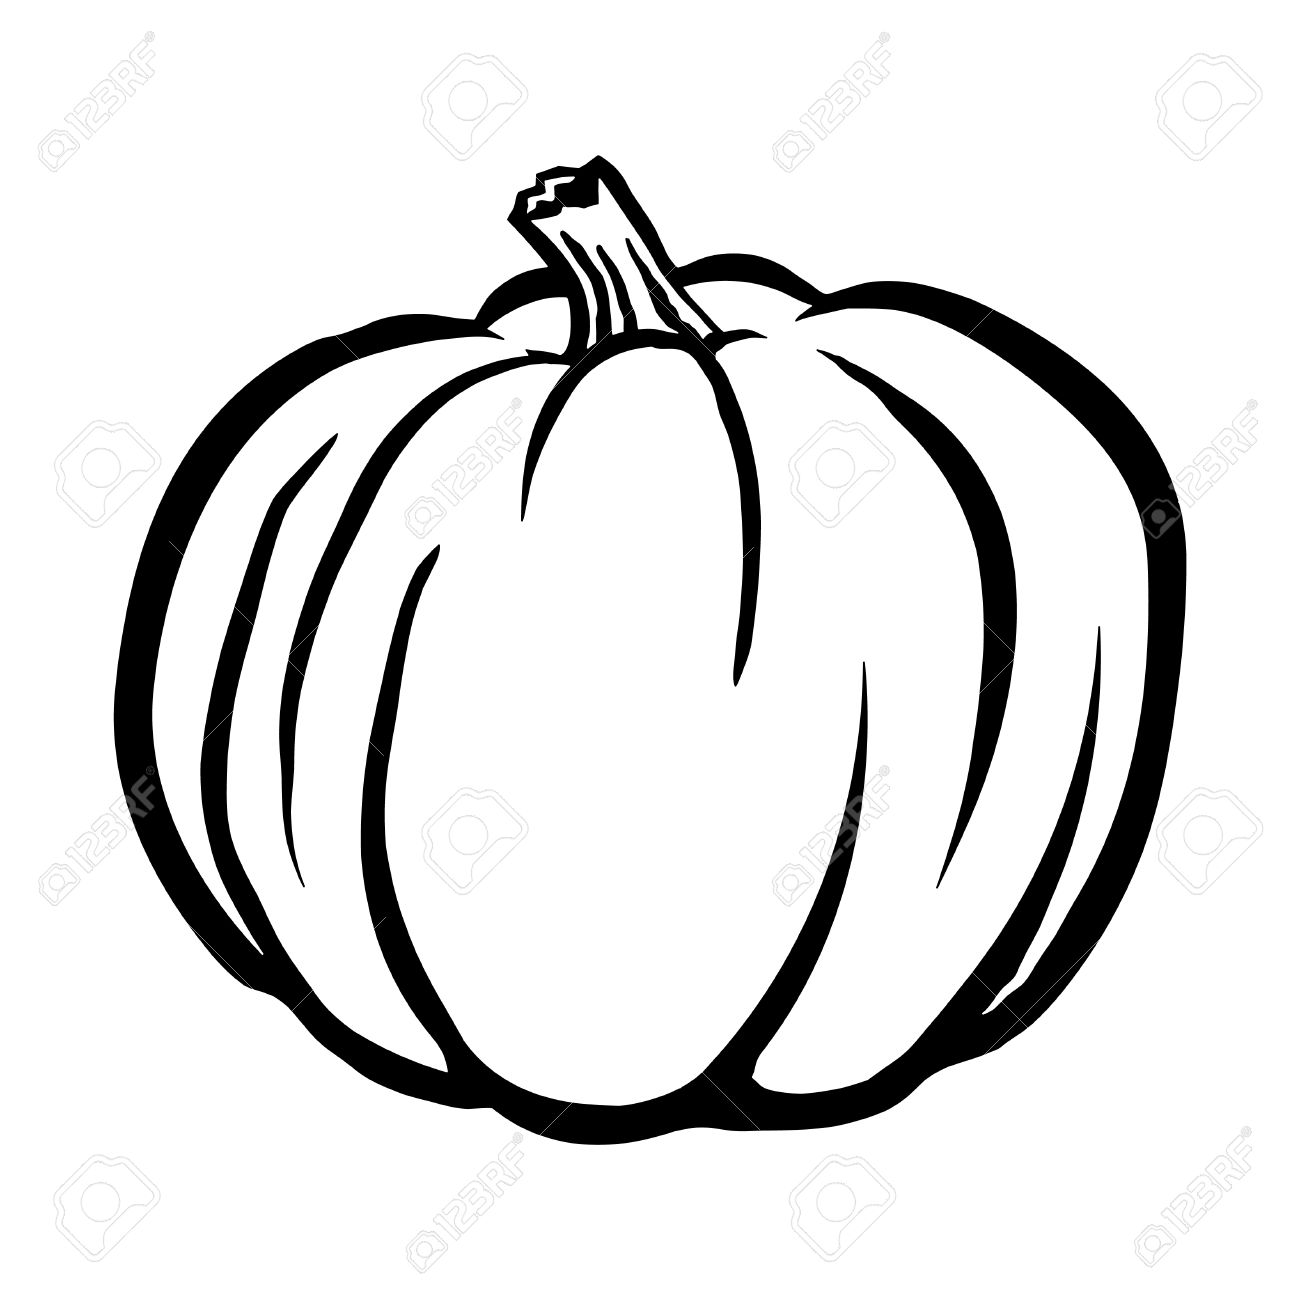 pumpkin vector icon royalty free cliparts vectors and stock rh 123rf com victor pumpkin by joe spencer victor pumpkin walk